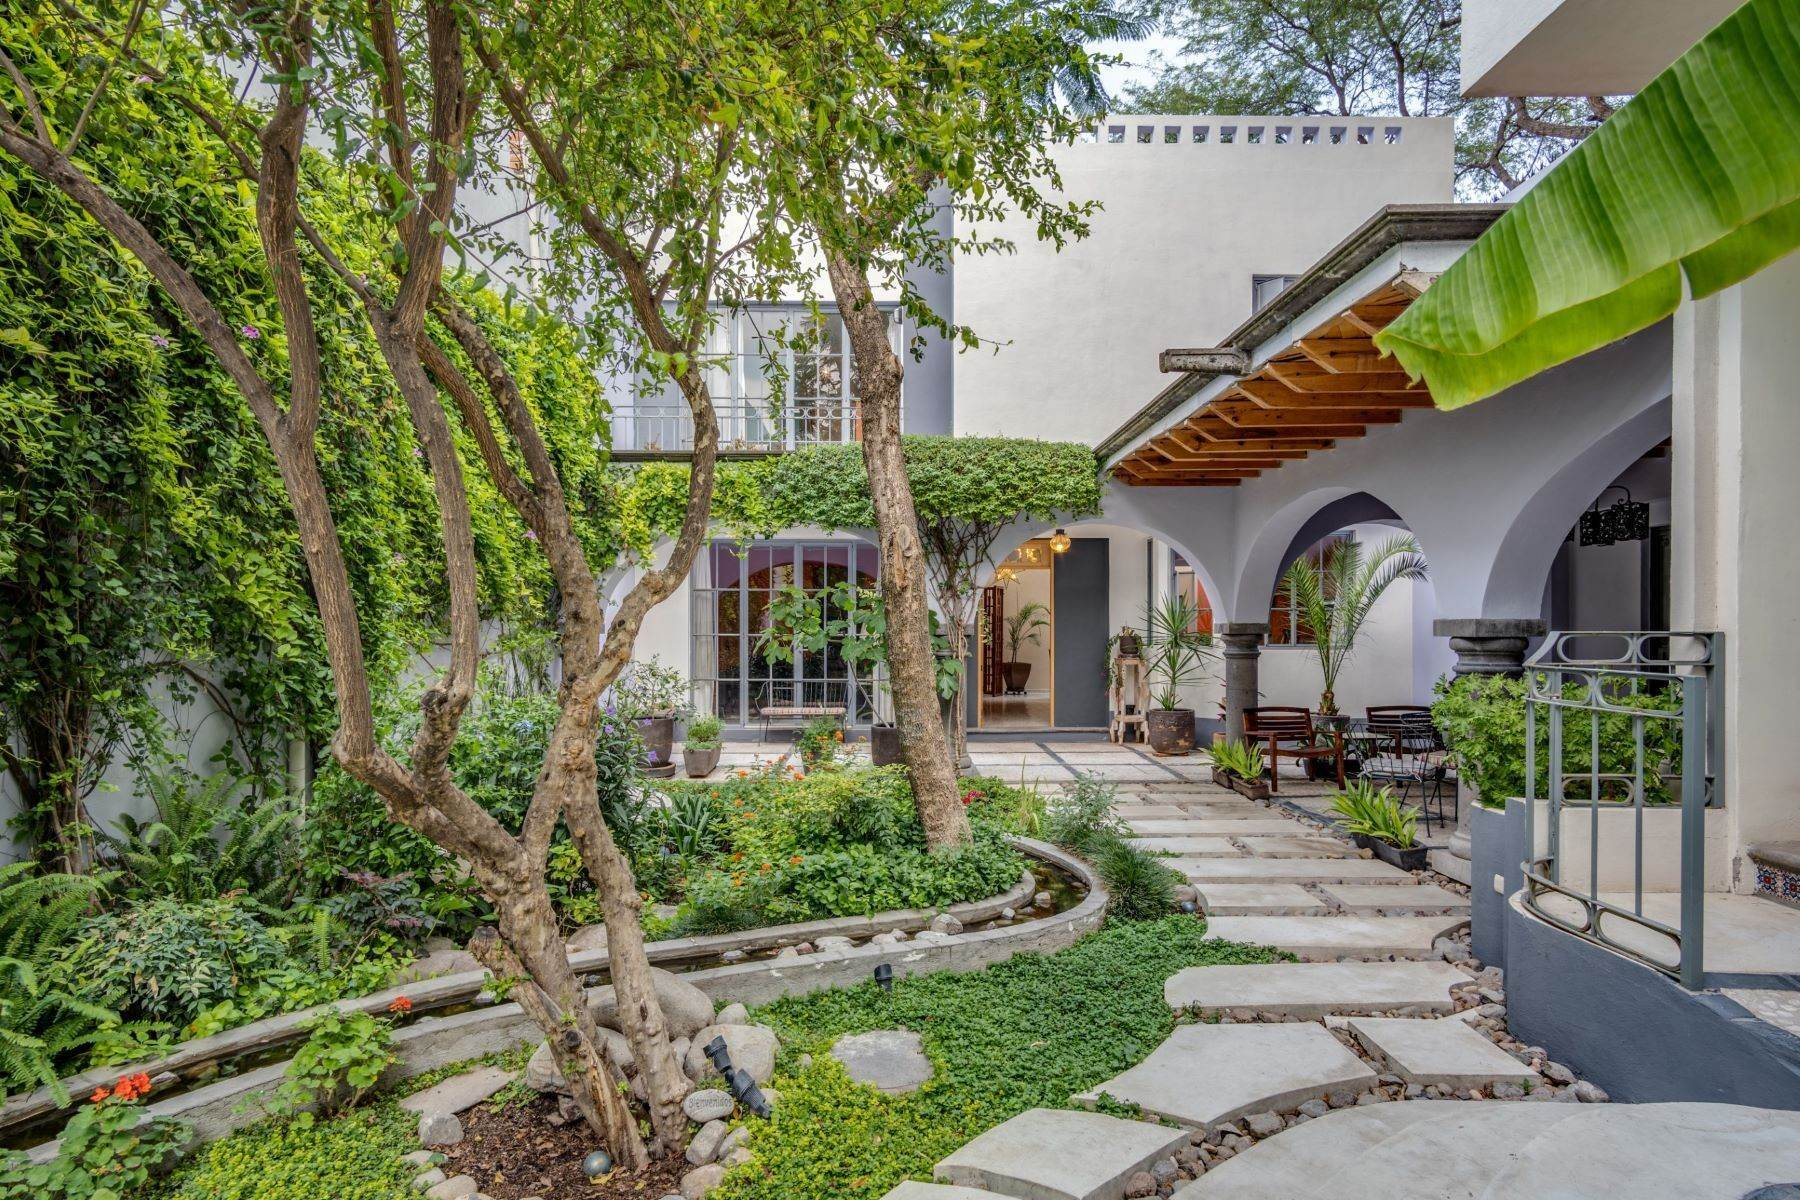 Property for Sale at Casa Jardin San Juan 18 San Miguel De Allende, Guanajuato 37750 Mexico